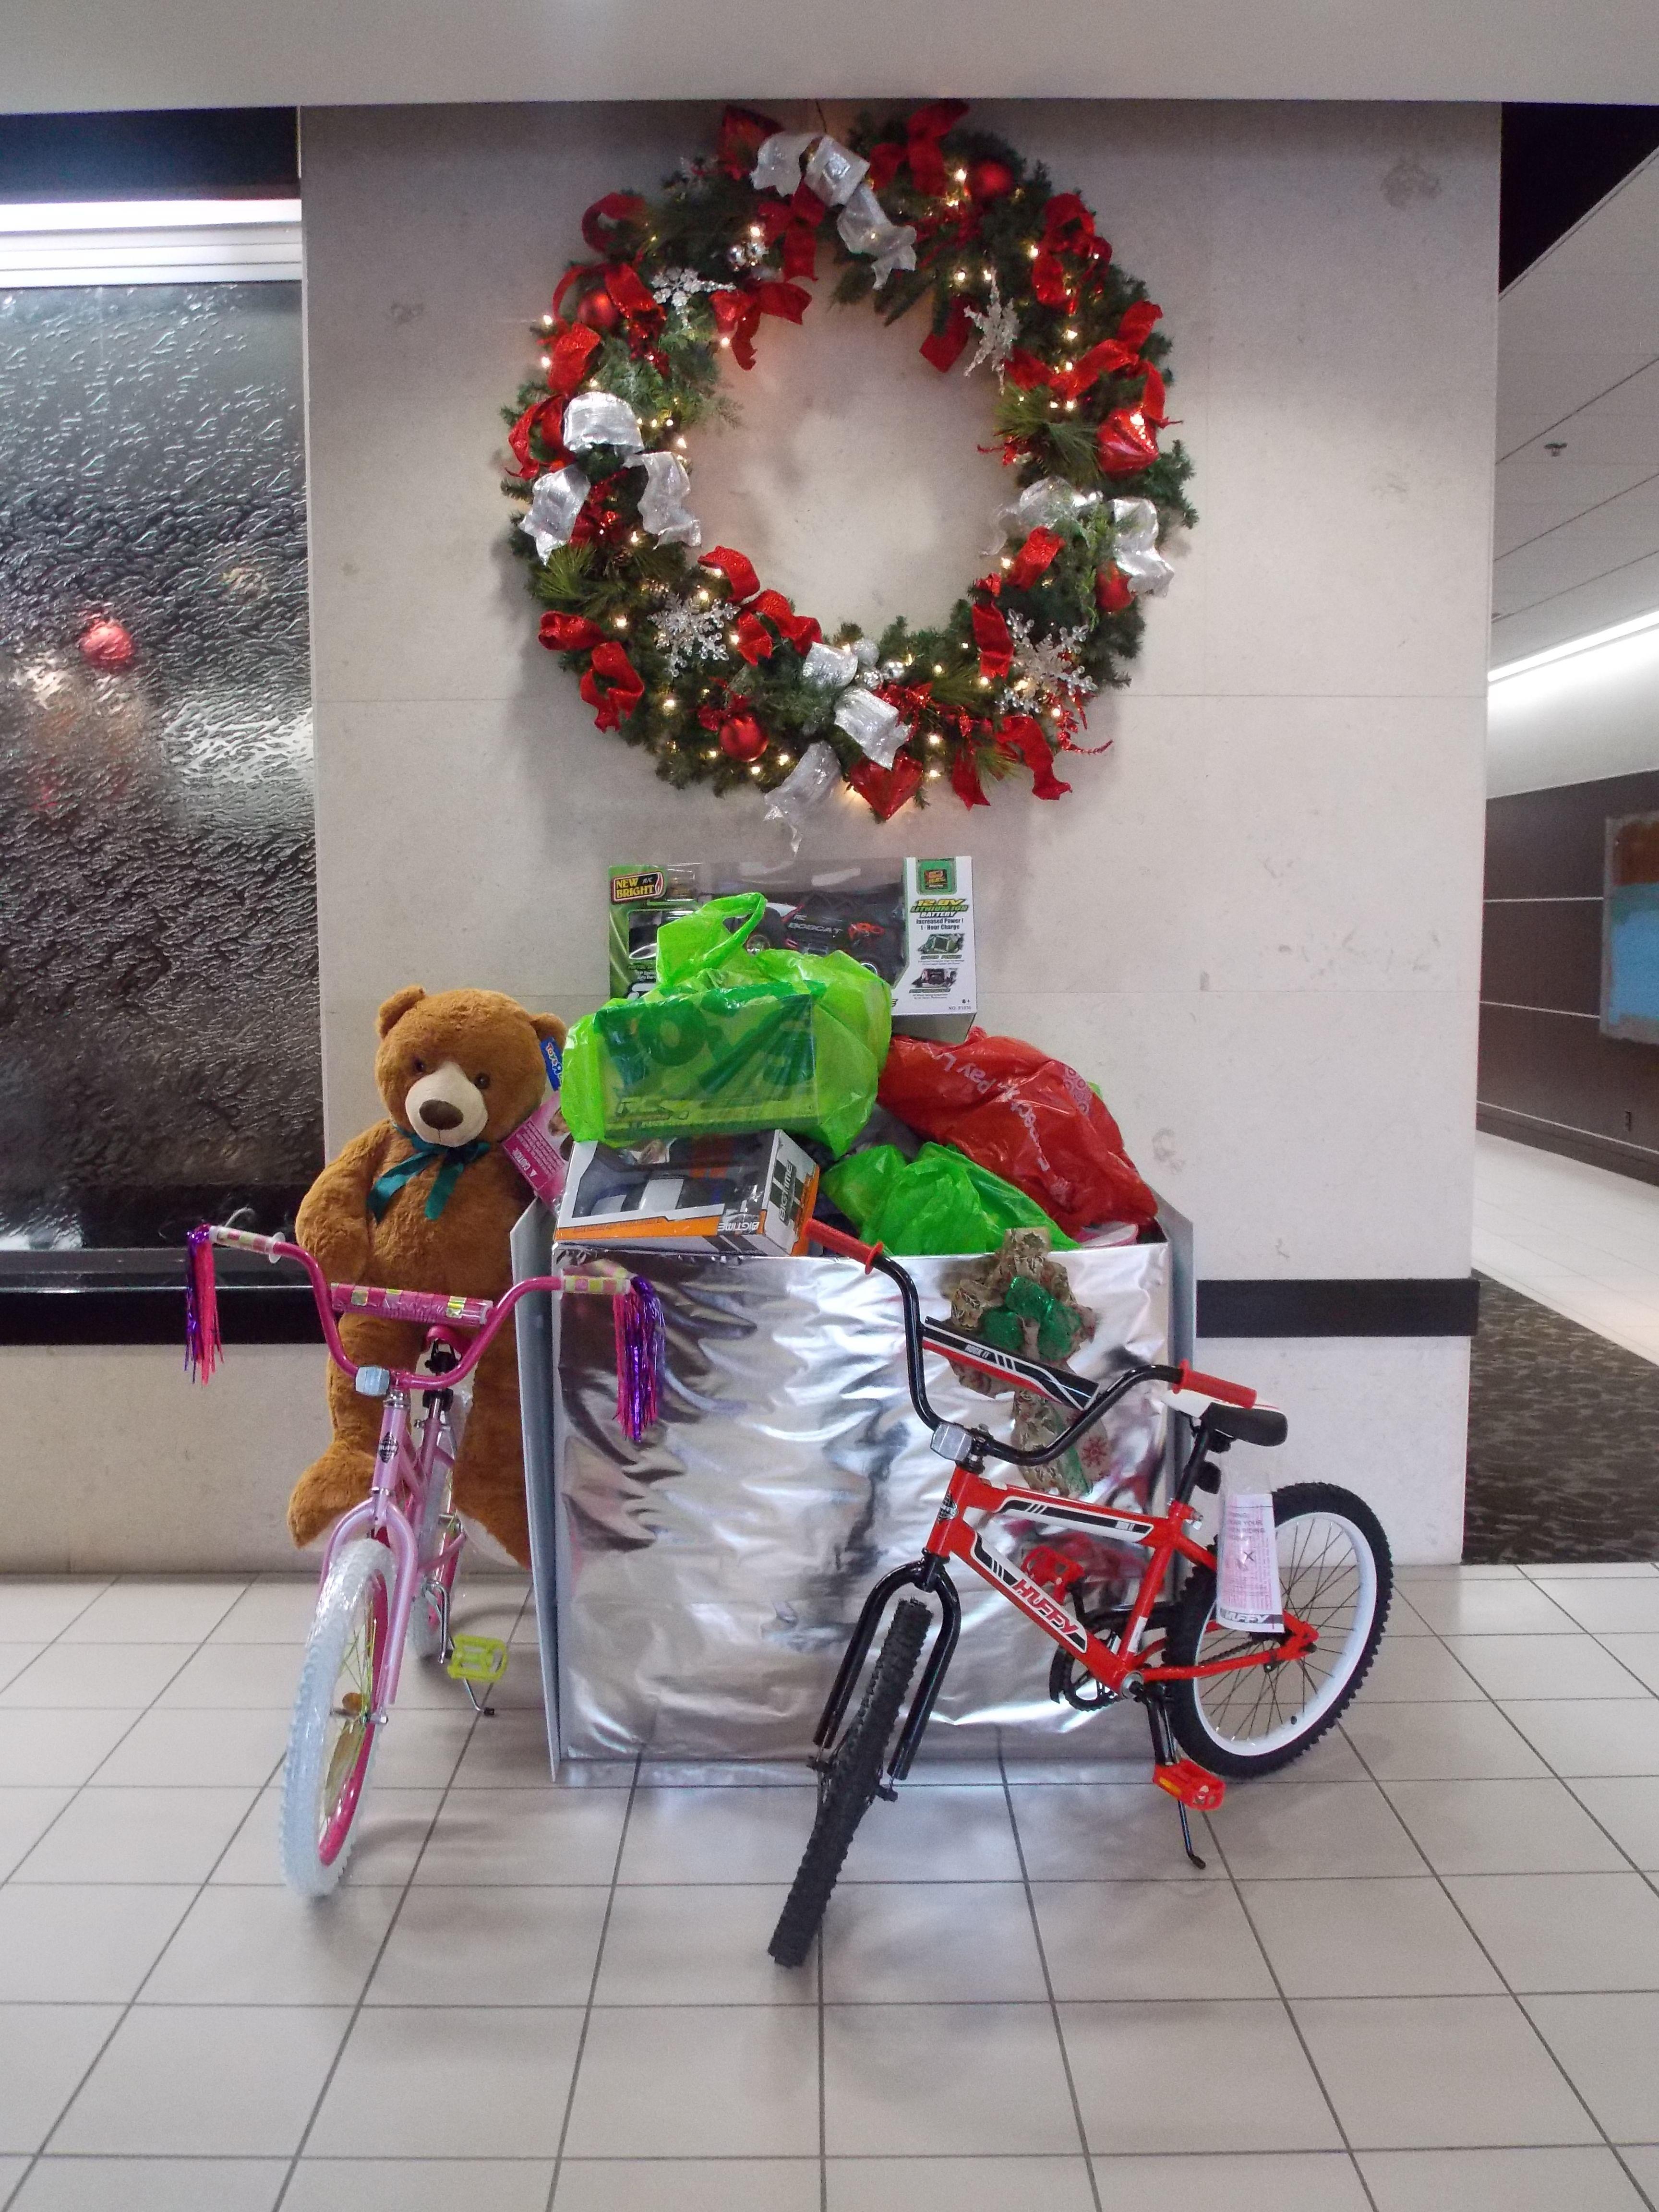 Toys for tots images  Community Involvement u Sponsorship at Lexus of Wayzata Thank you